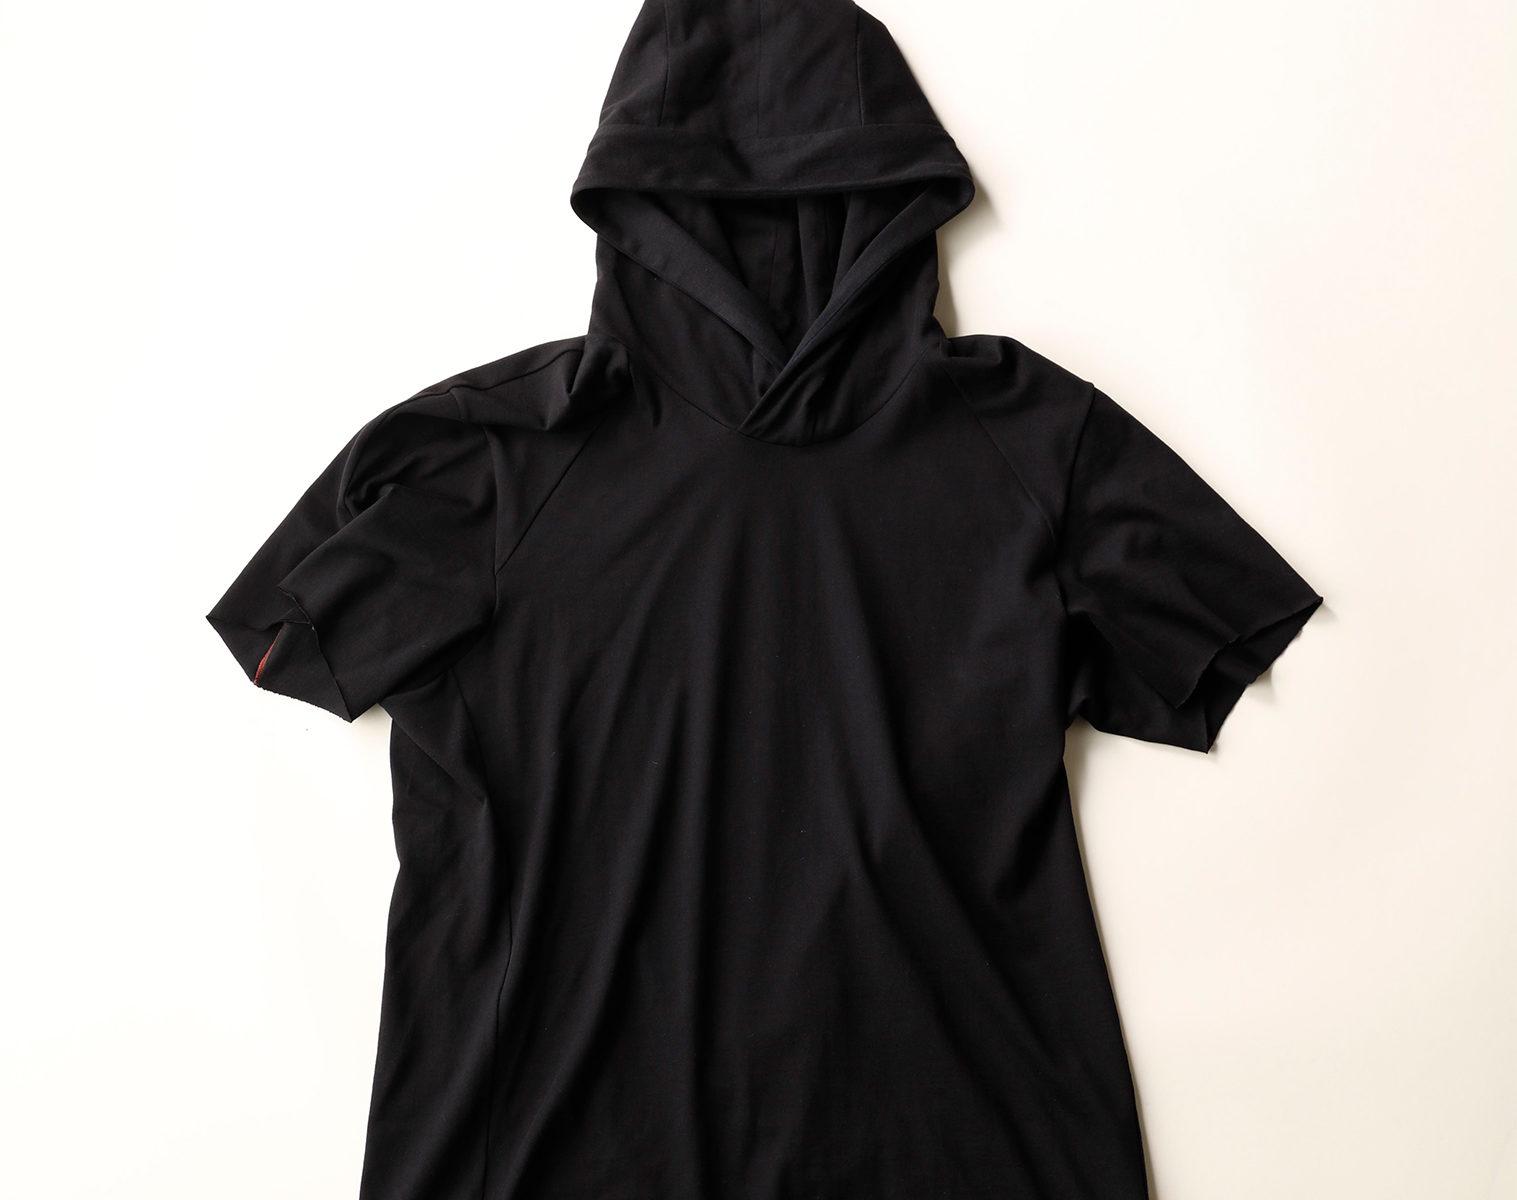 DEVOA Short Sleeve Hooded Sweater 1